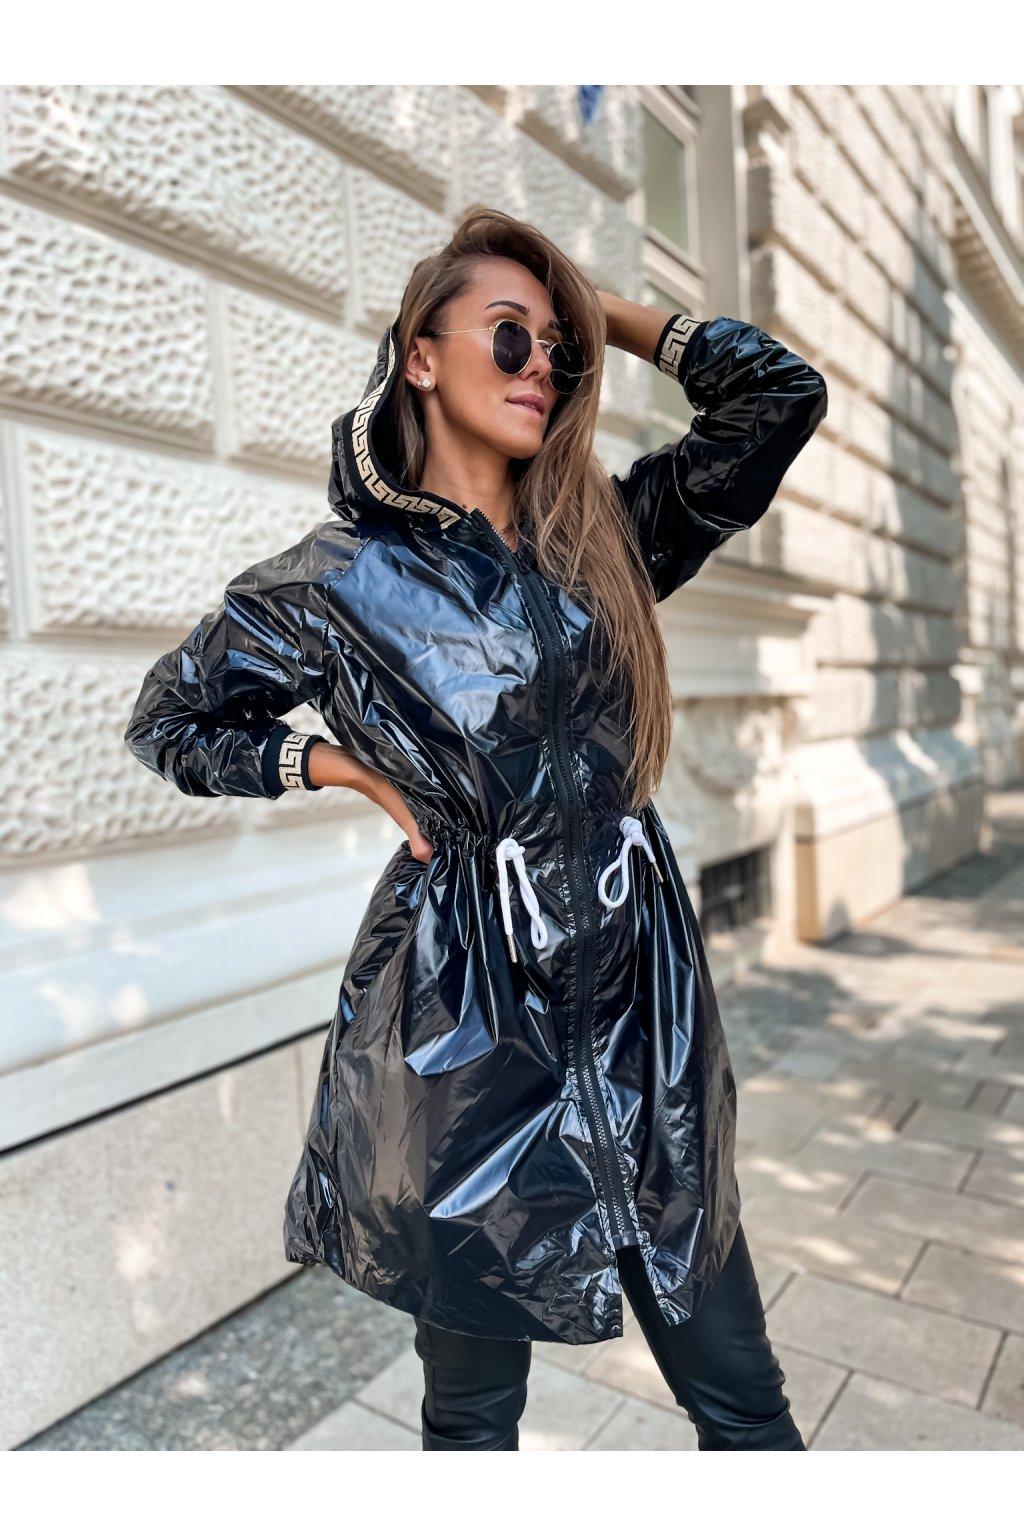 damska prodlouzena bunda verra black eshopat cz 1